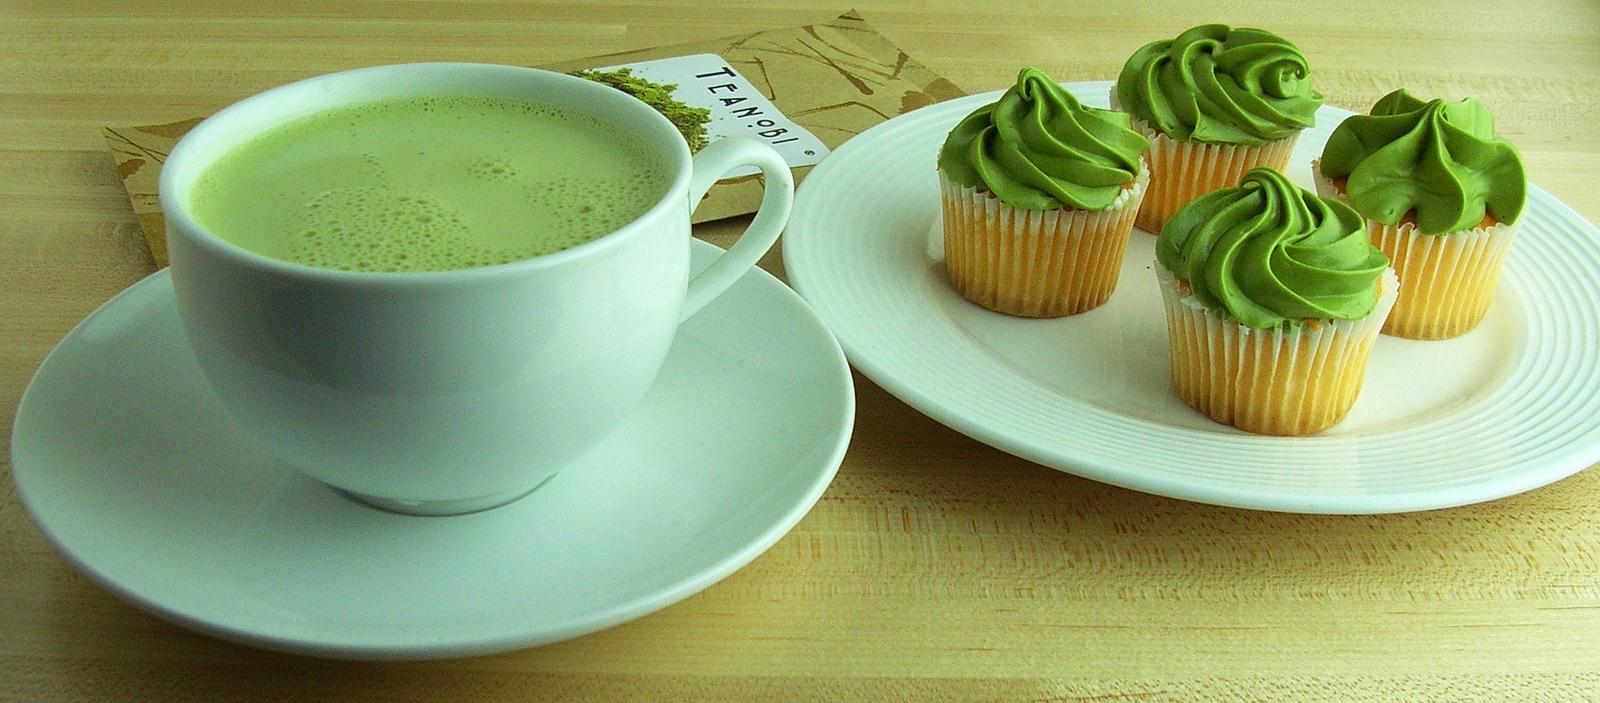 Matcha Latte and Cupcakes with Matcha Frosting | © Kirinohana/Flickr